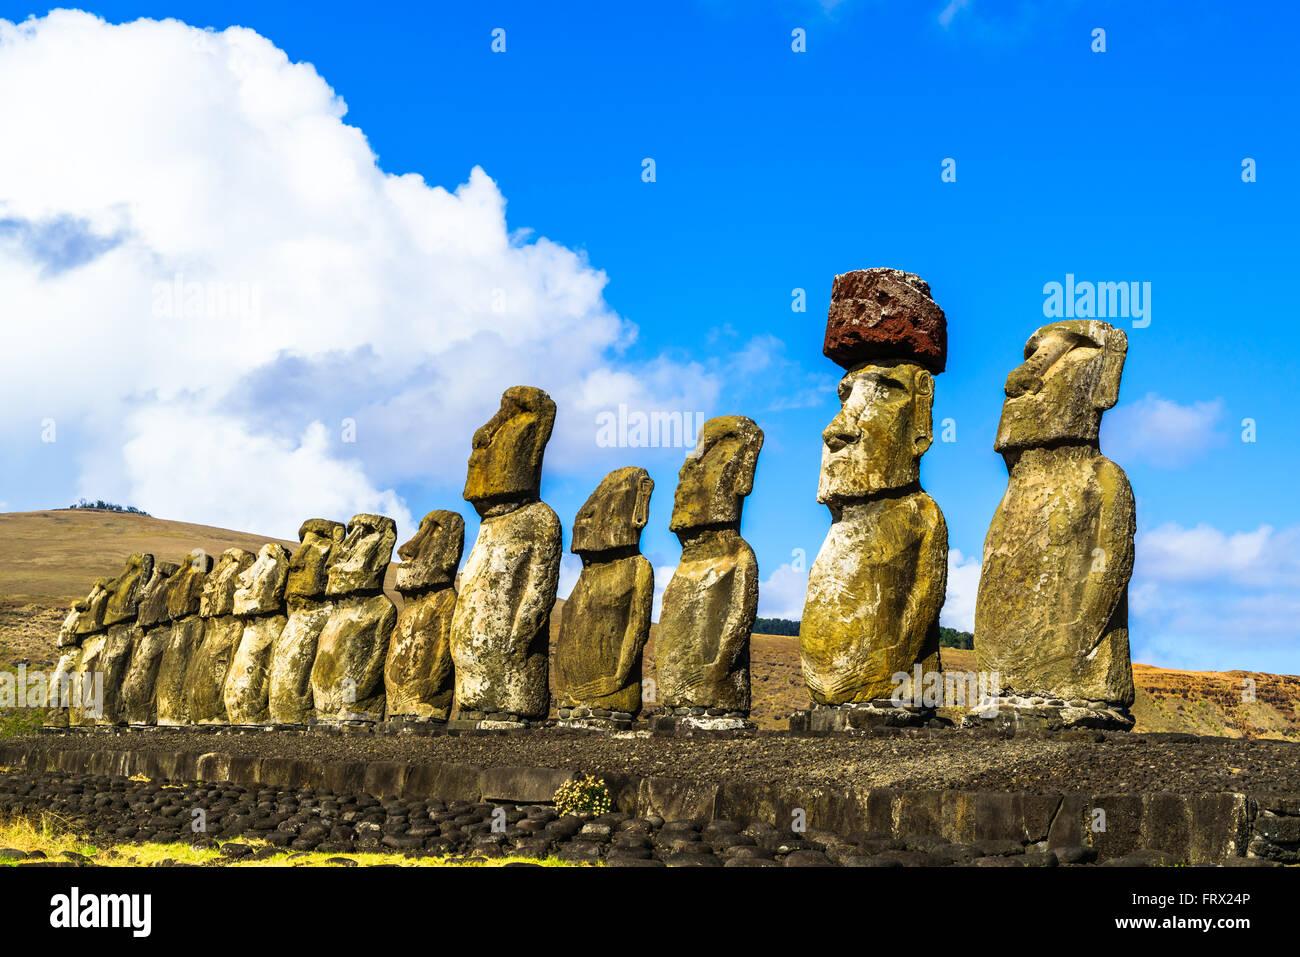 Moai en Ahu Tongariki permanente en la Isla de Pascua, Chile Imagen De Stock